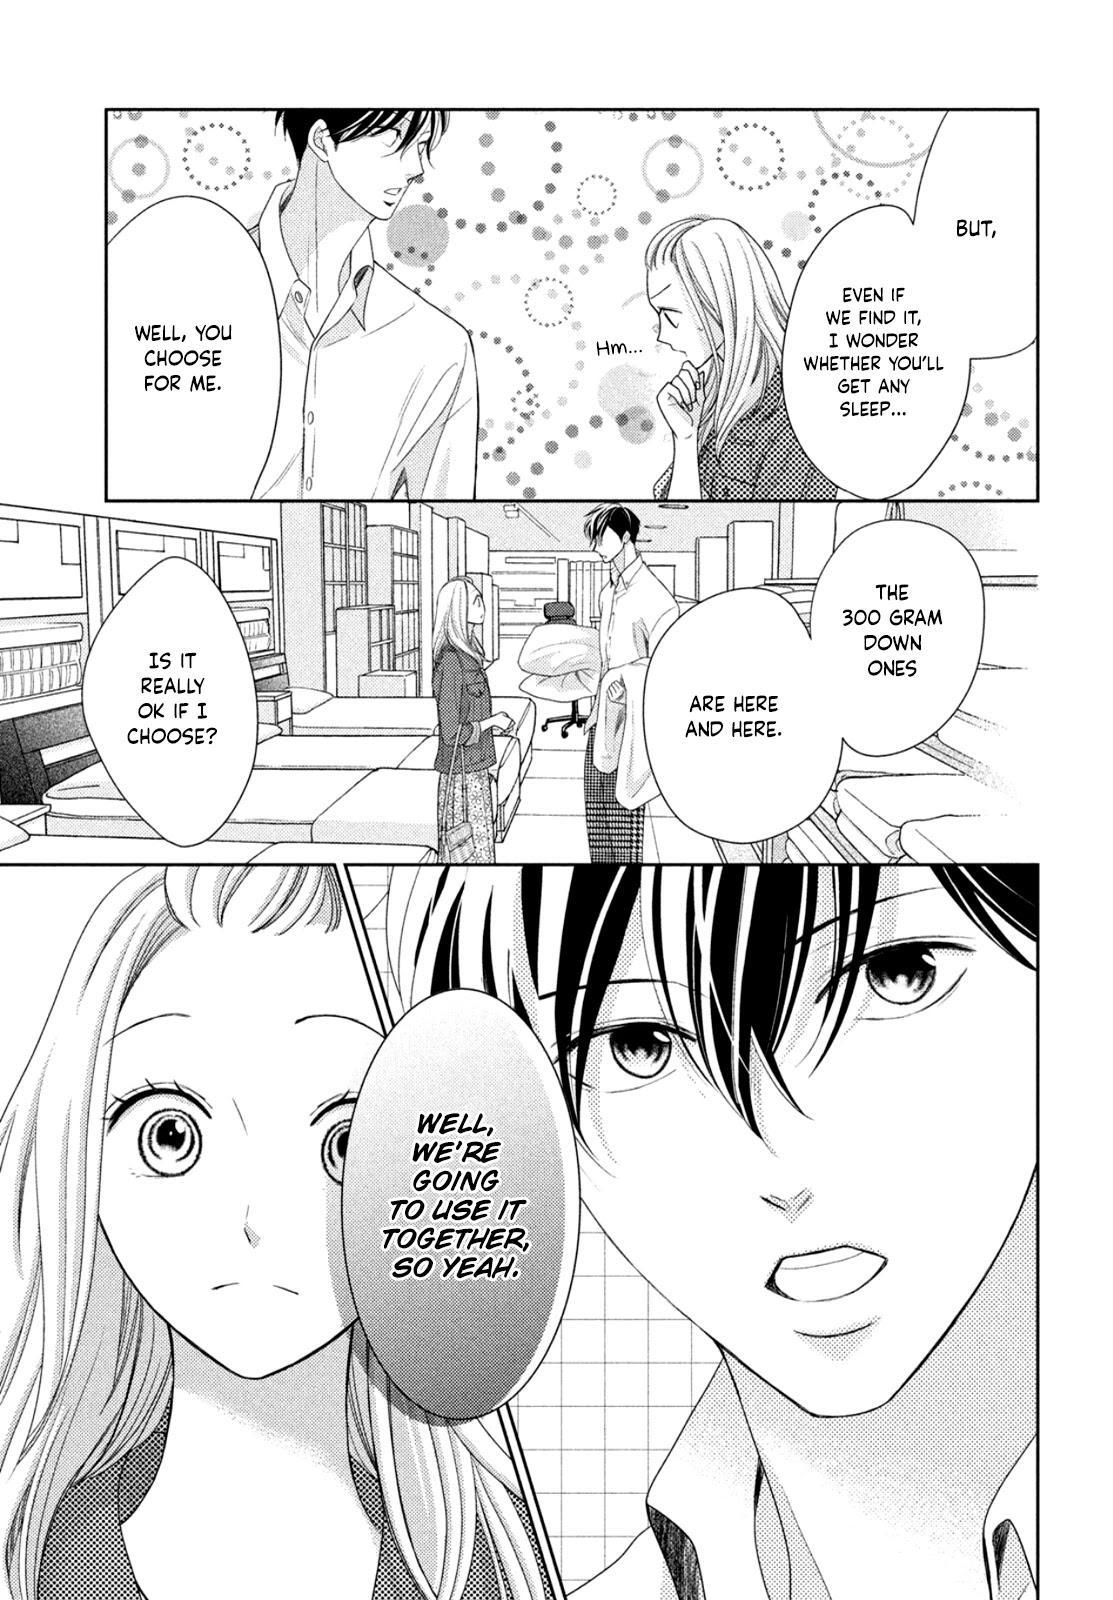 Arashi-Kun No Dakimakura Chapter 7: Because We're The Same page 21 - Mangakakalots.com